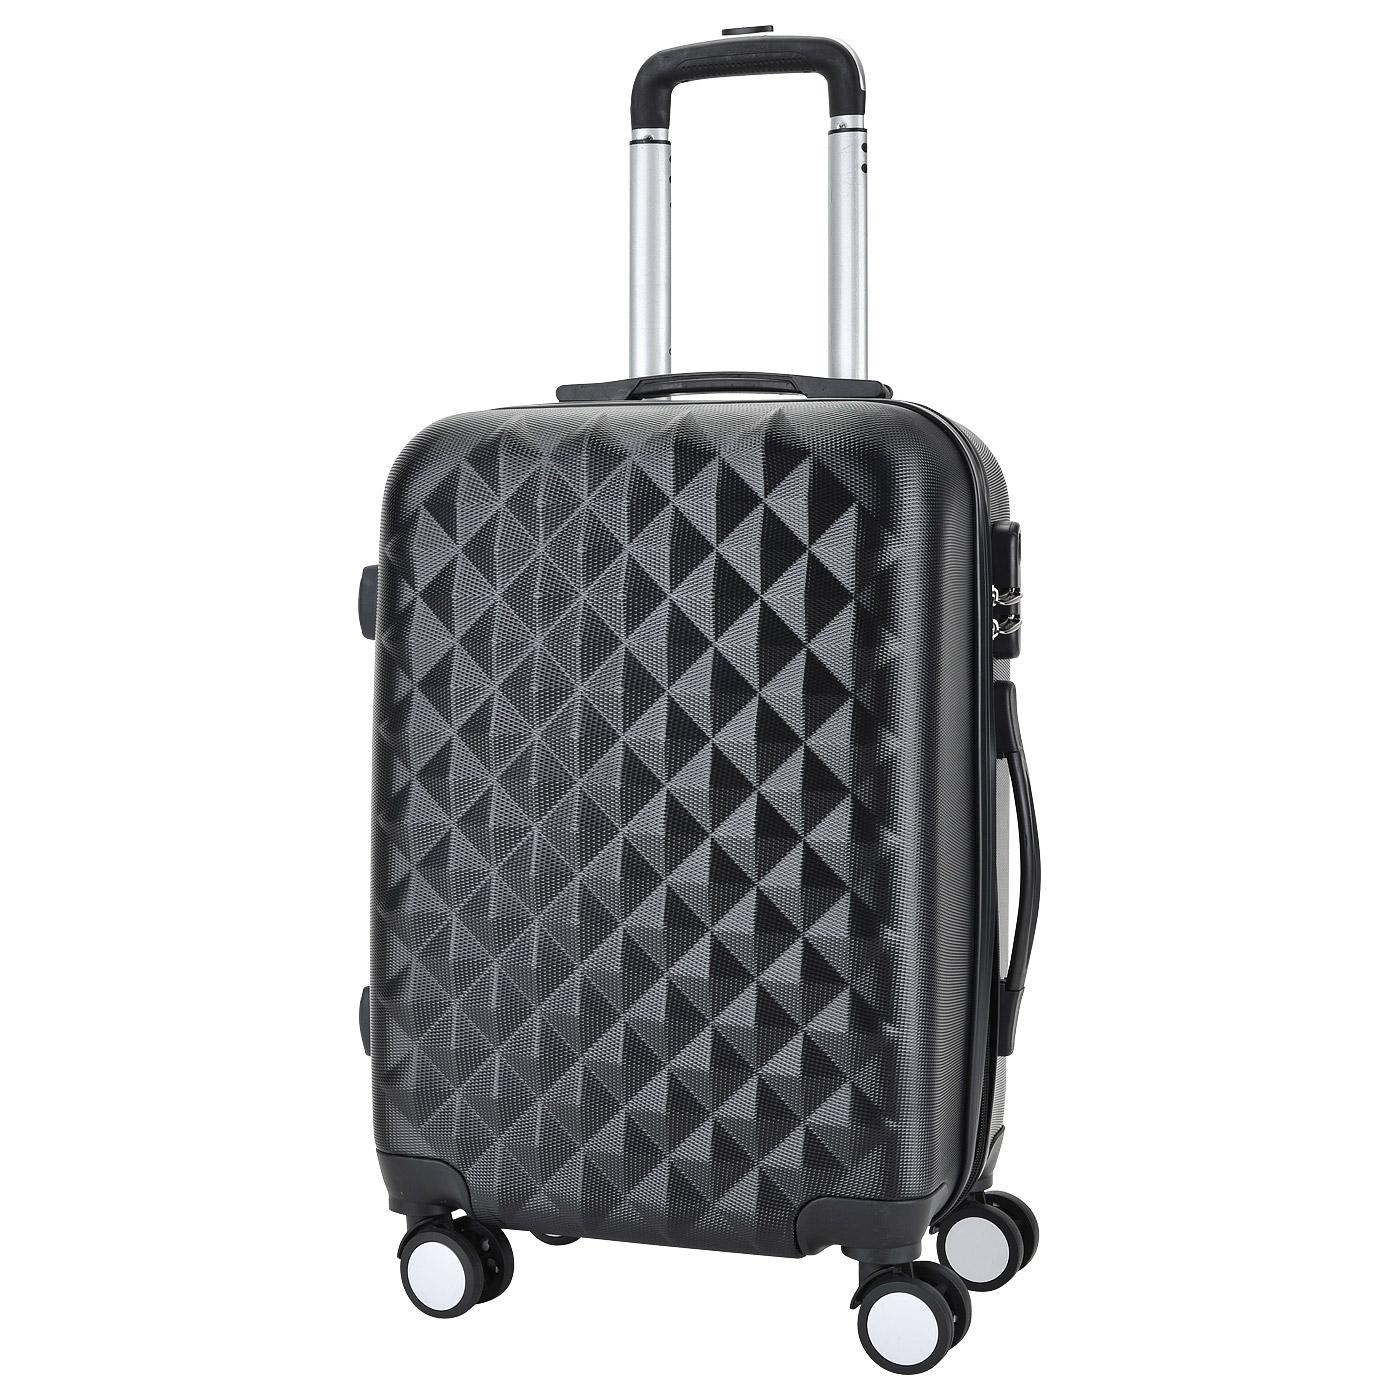 Дорожные сумки на колесиках в нальчике рюкзаки swissgear цена